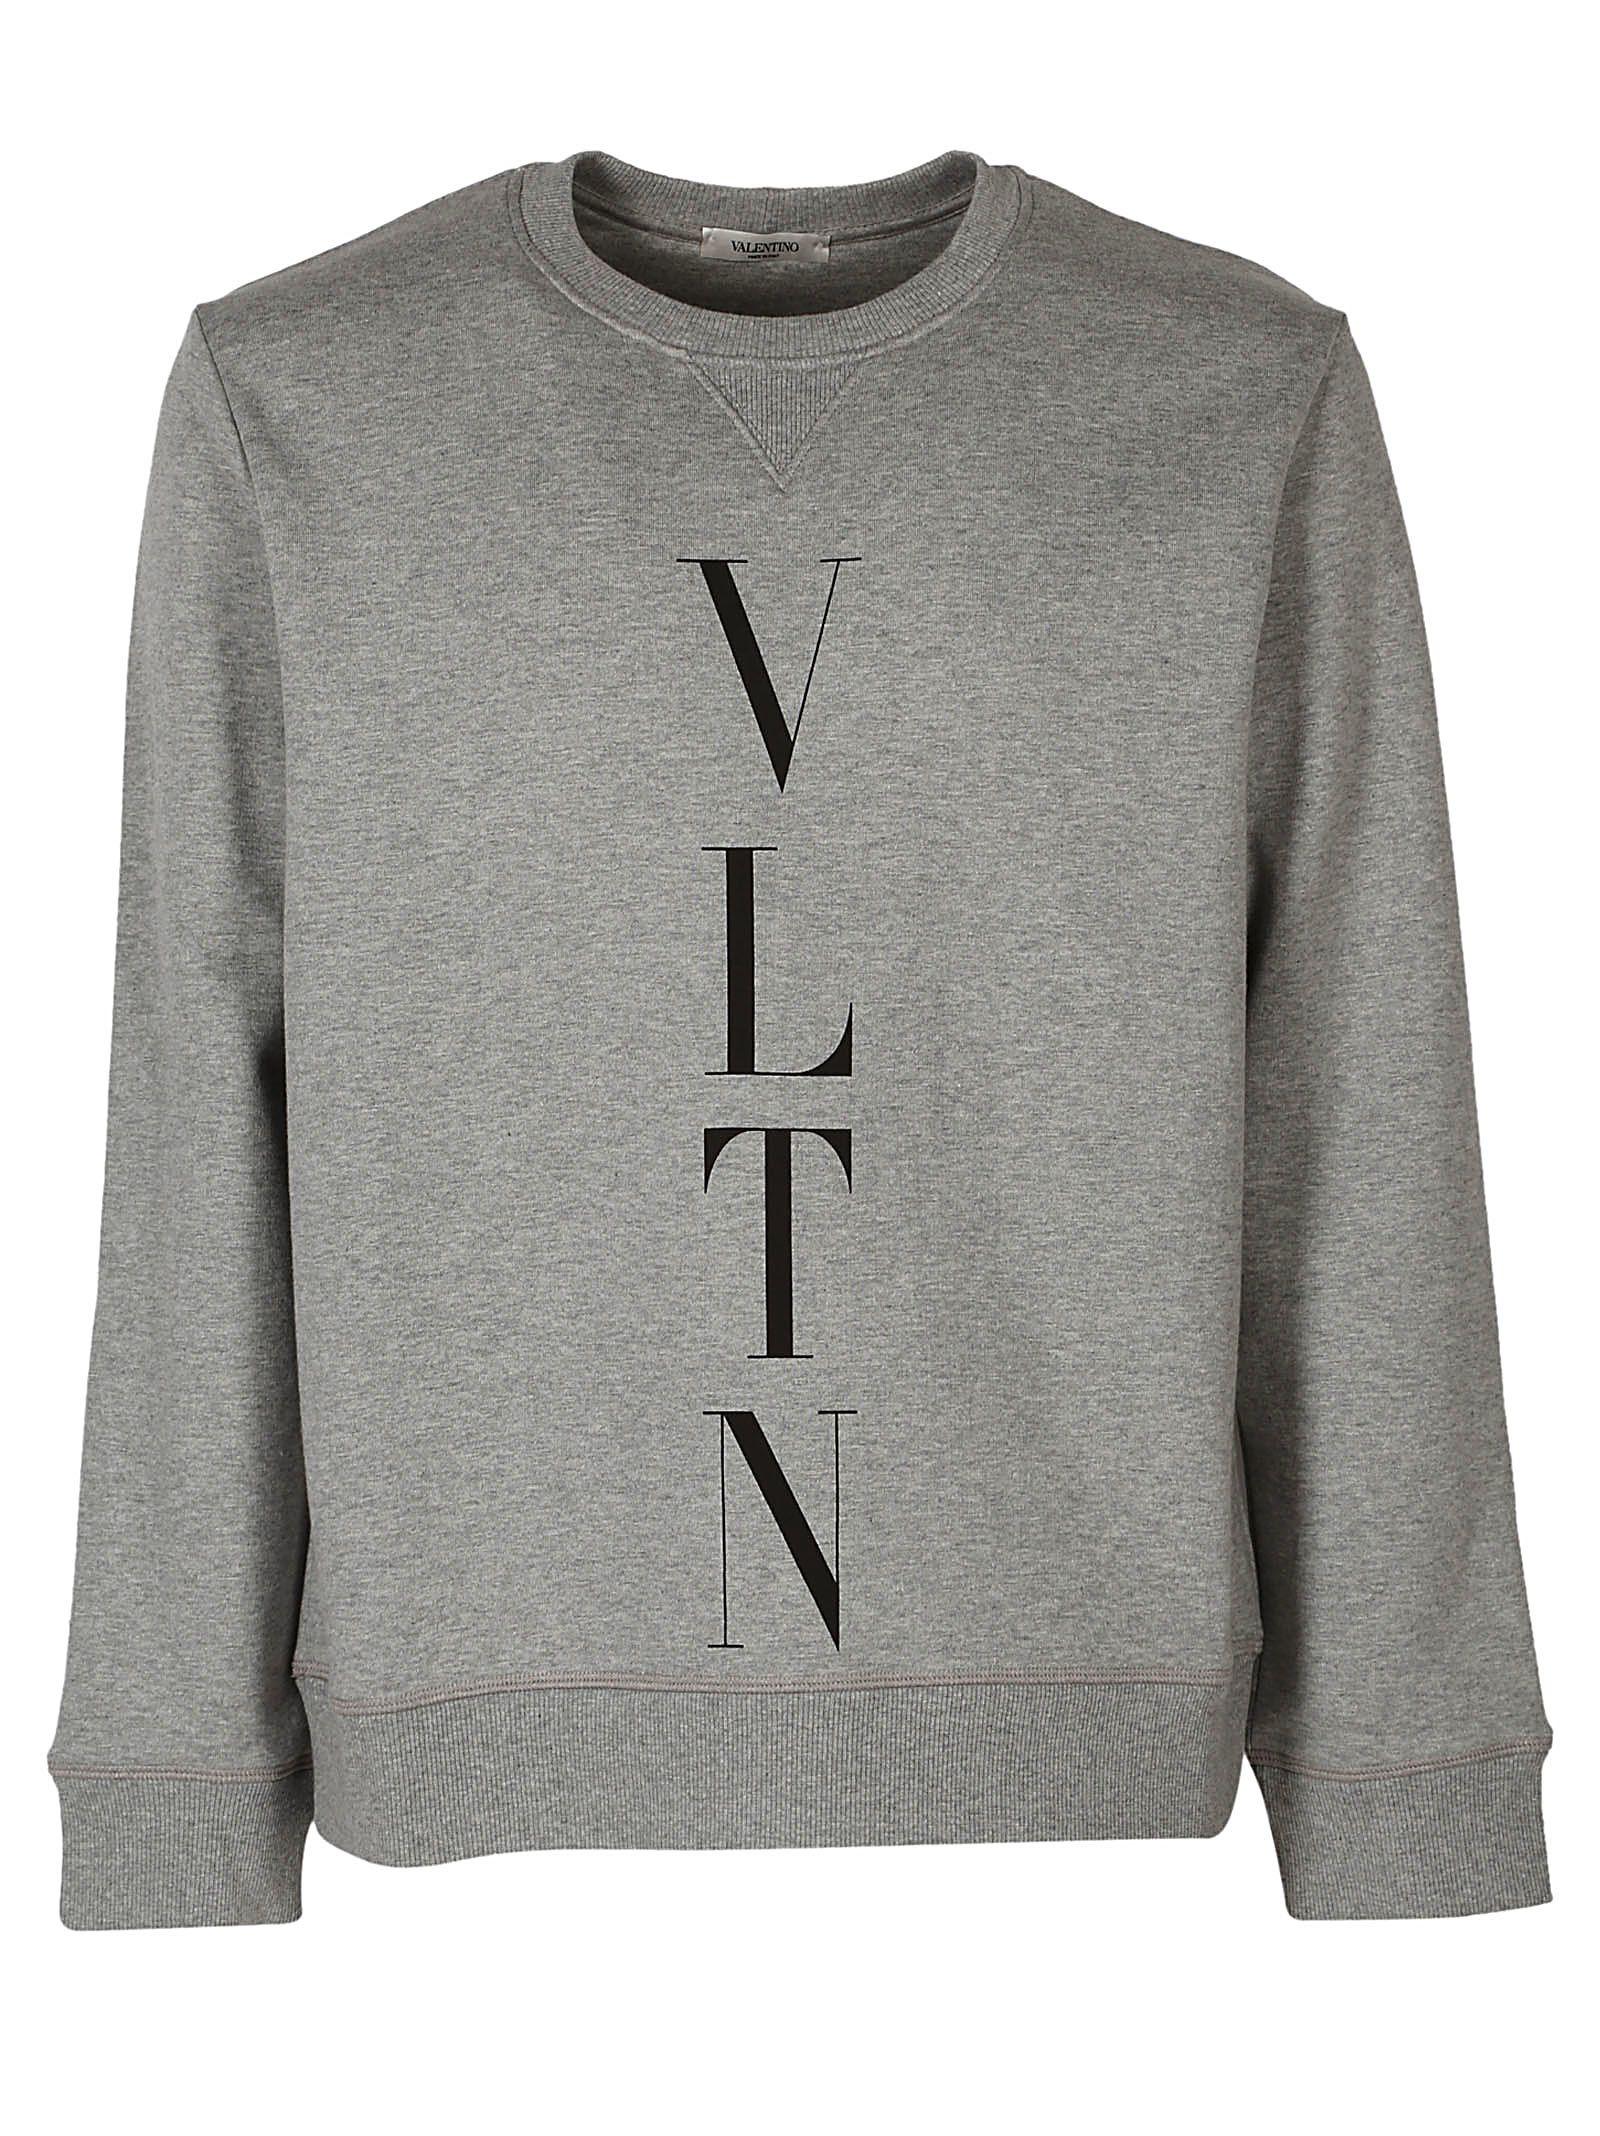 Valentino Prêt-à-porter Sweatshirt